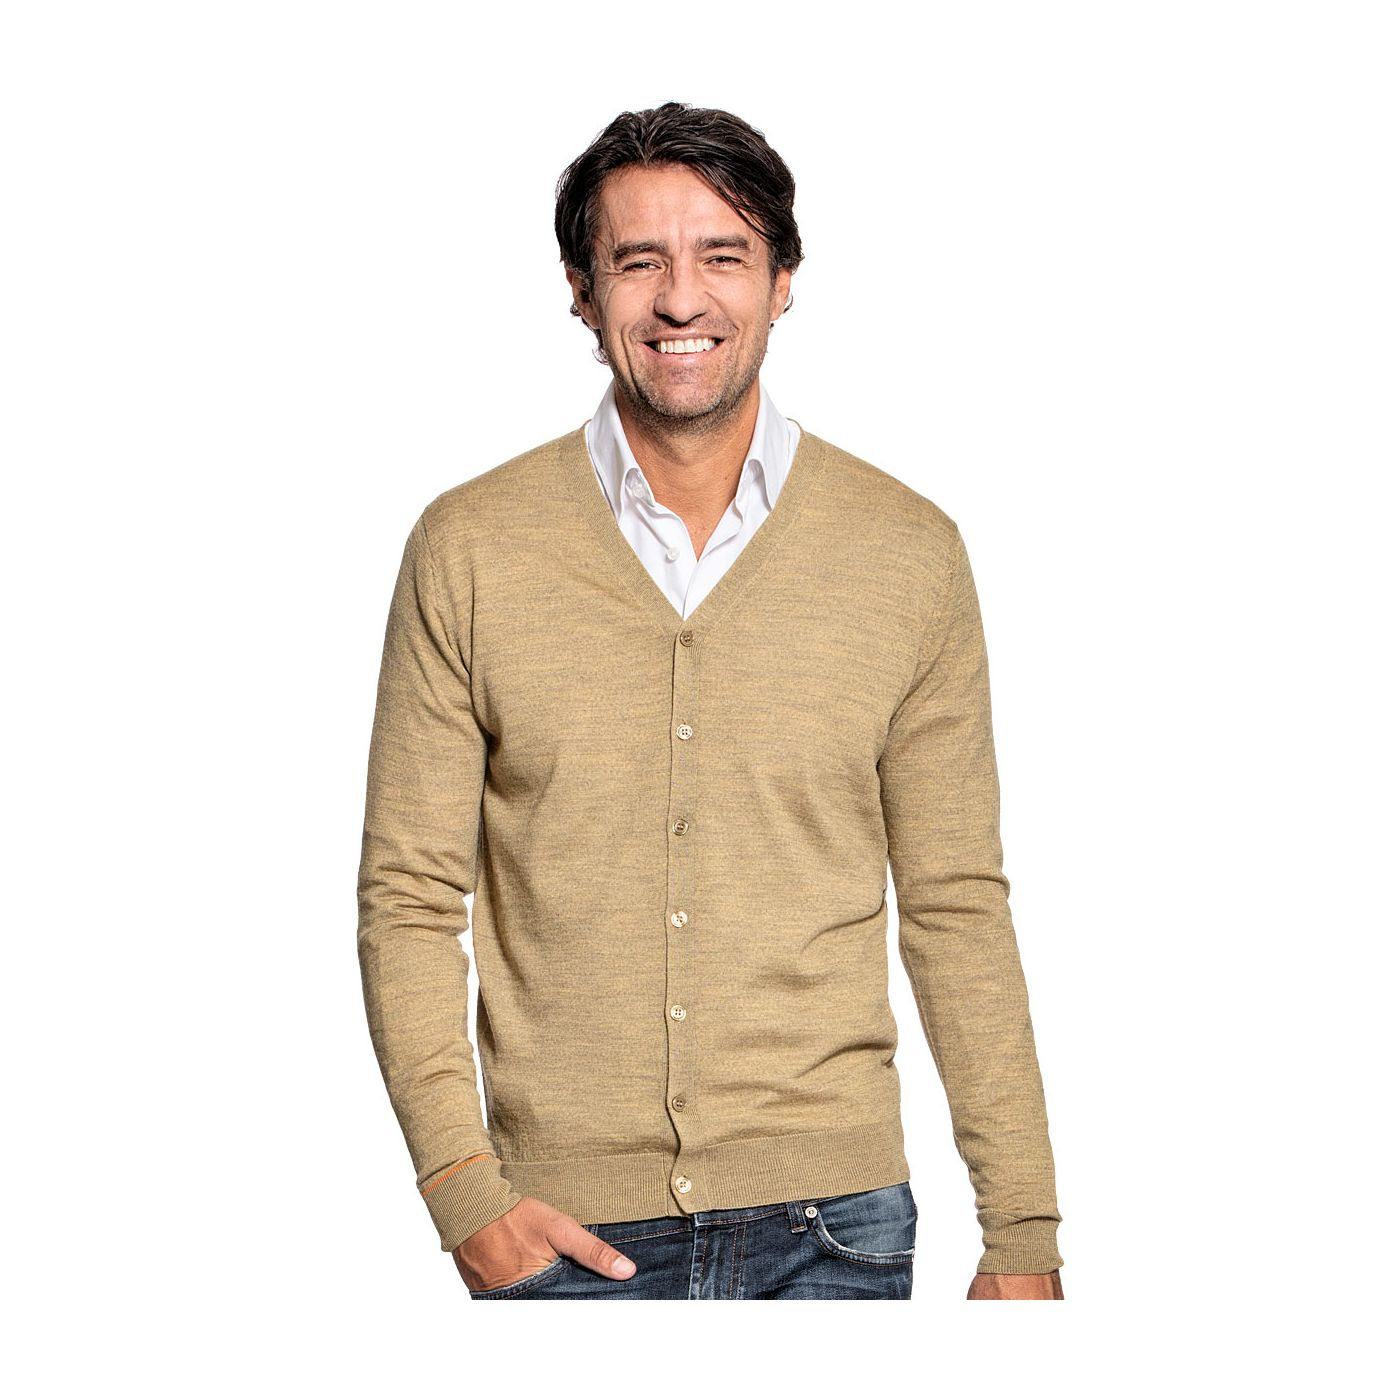 Cardigan for men made of Merino wool in Yellow